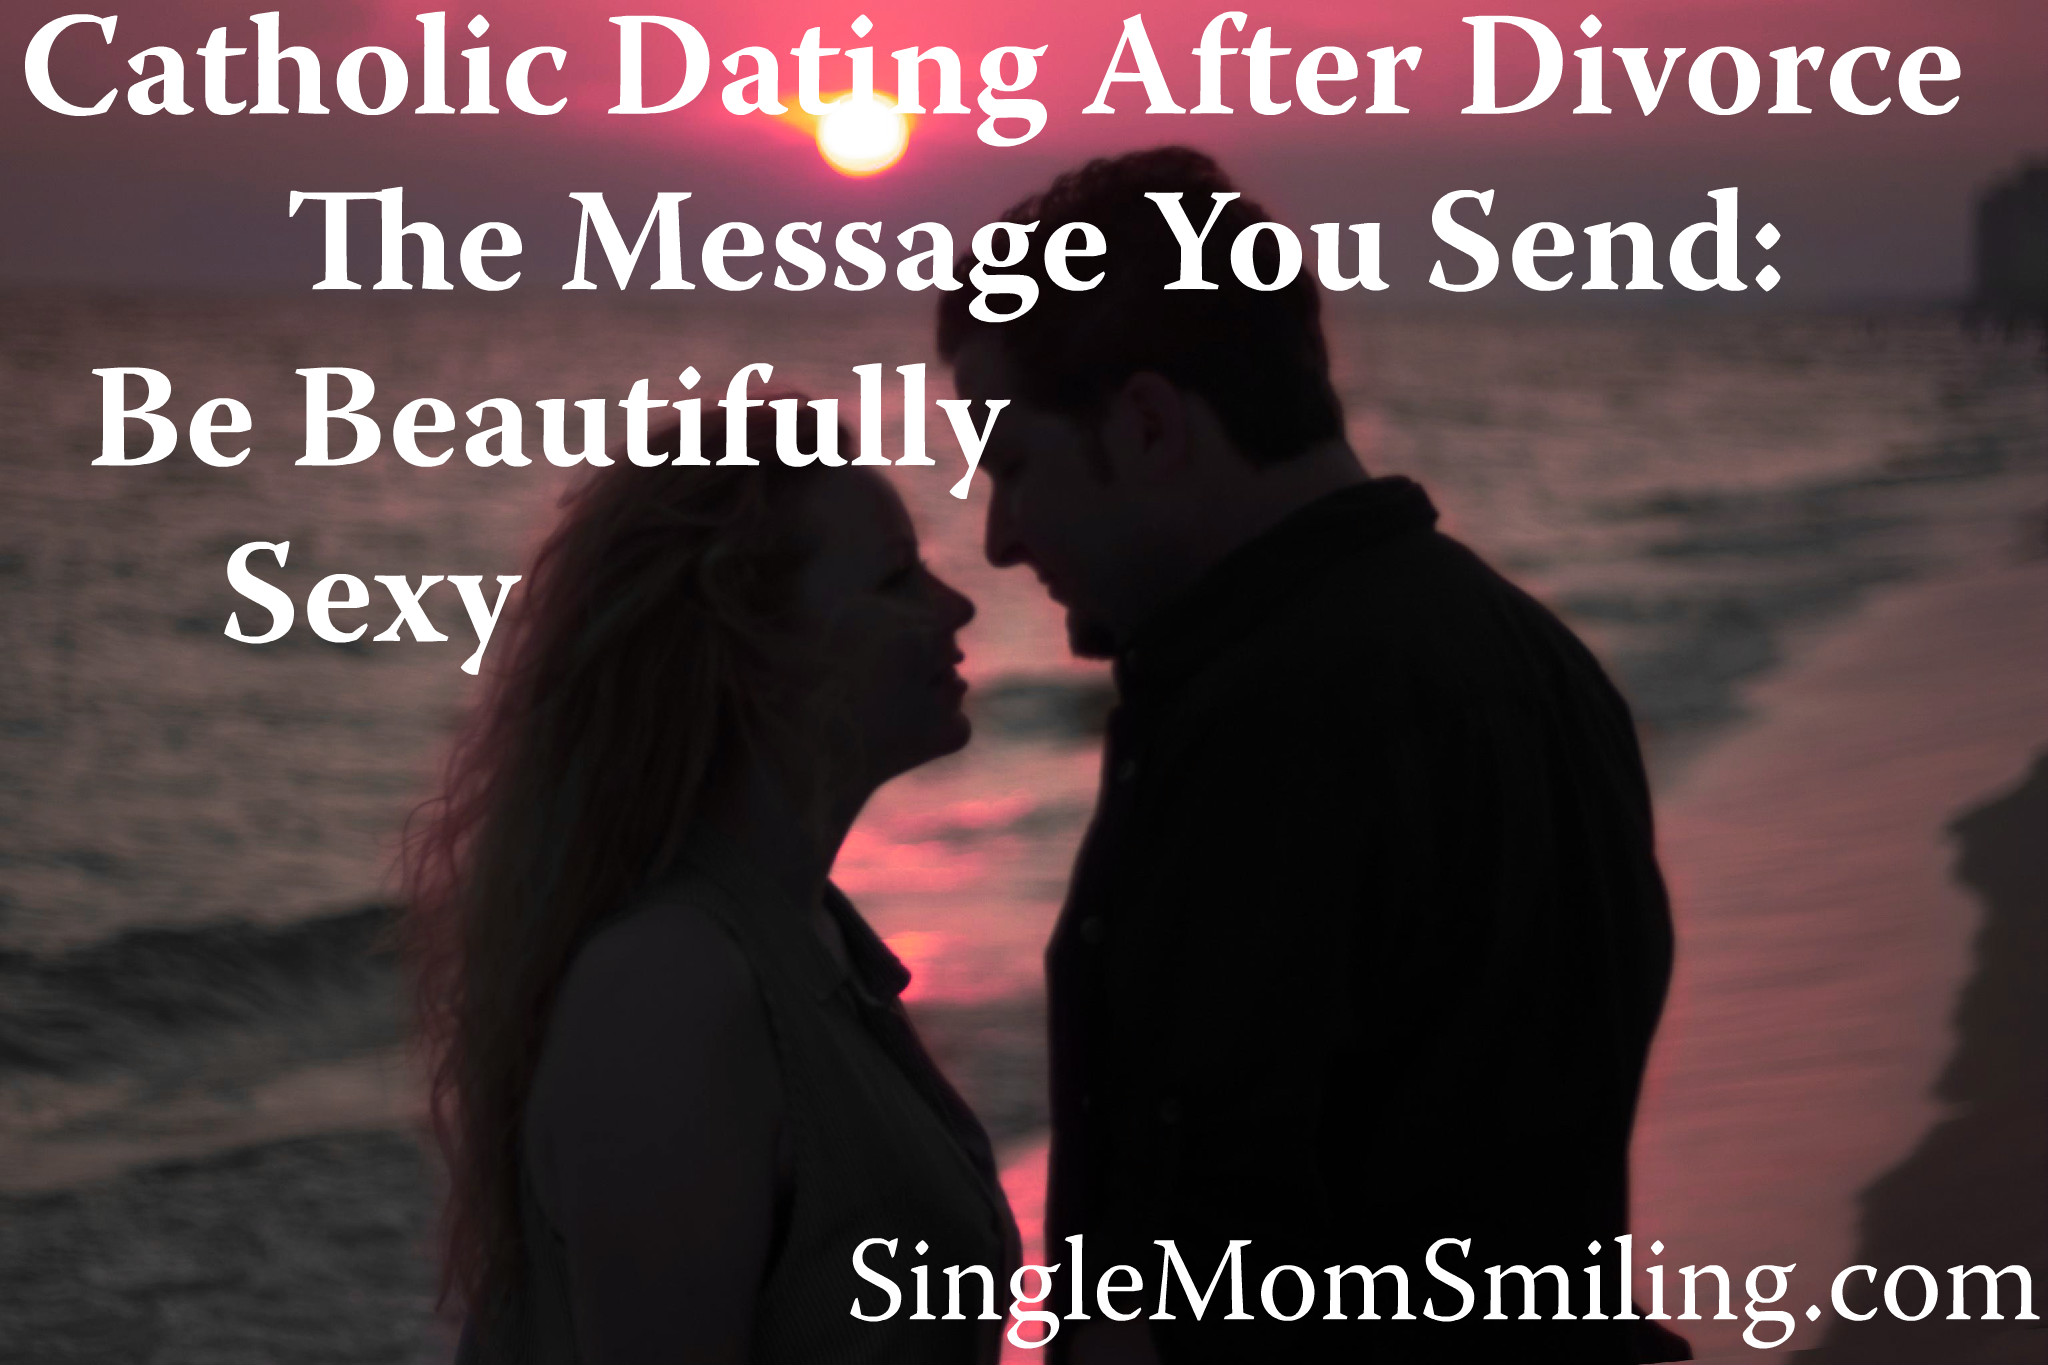 Catholic dating divorced man